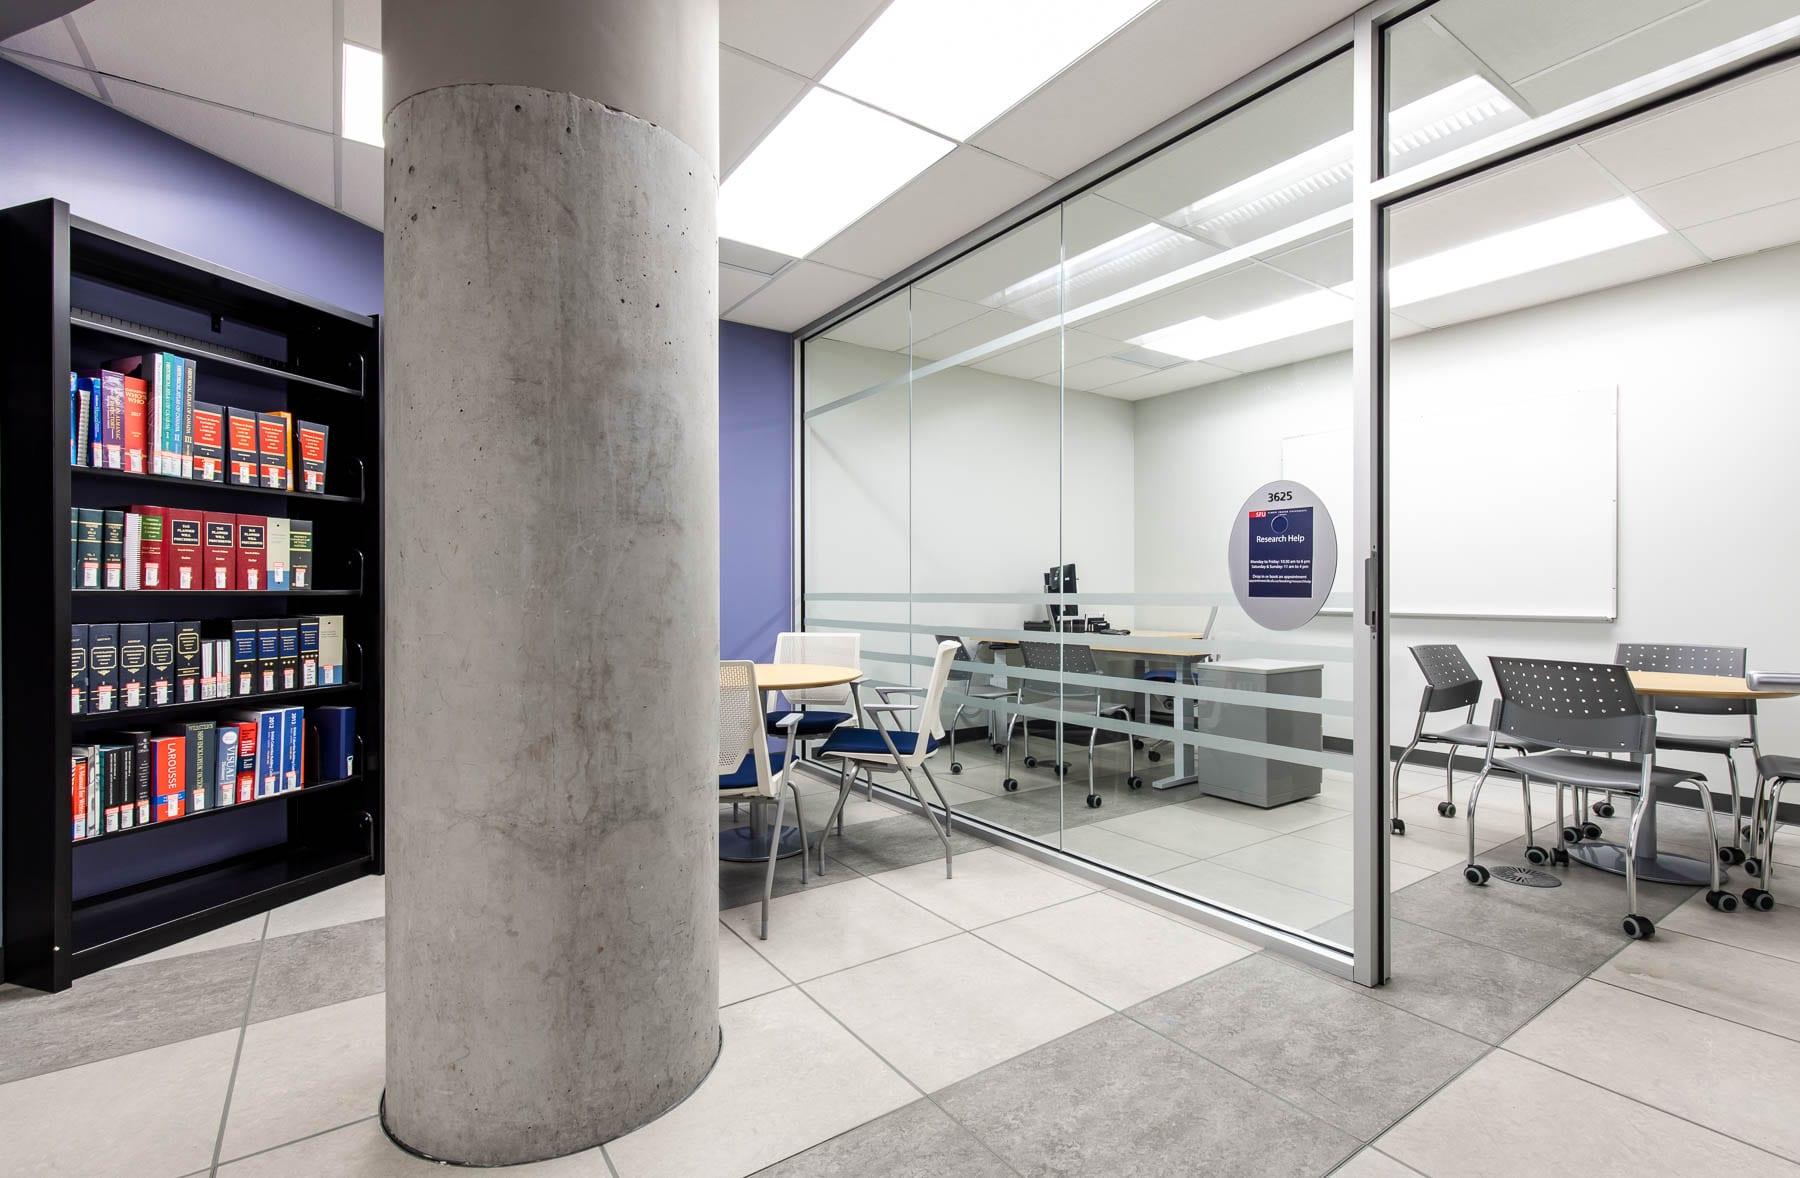 SFU – Fraser Library & IT Help Desk meeting room